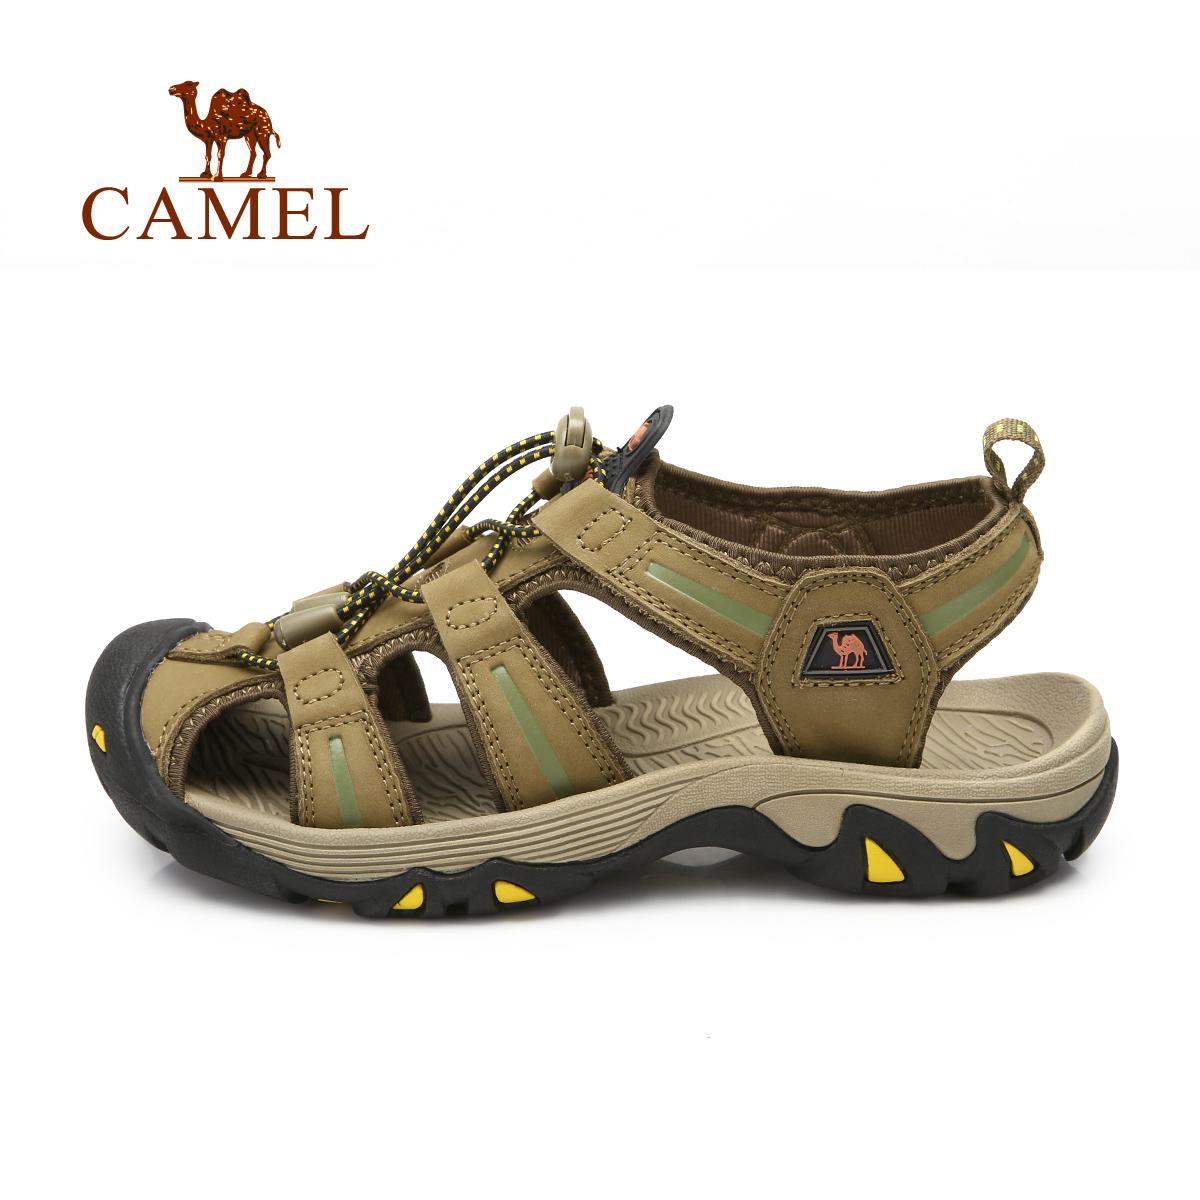 CAMEL駱駝戶外沙灘鞋 男女情侶款春夏頭層牛皮防撞耐磨涼鞋